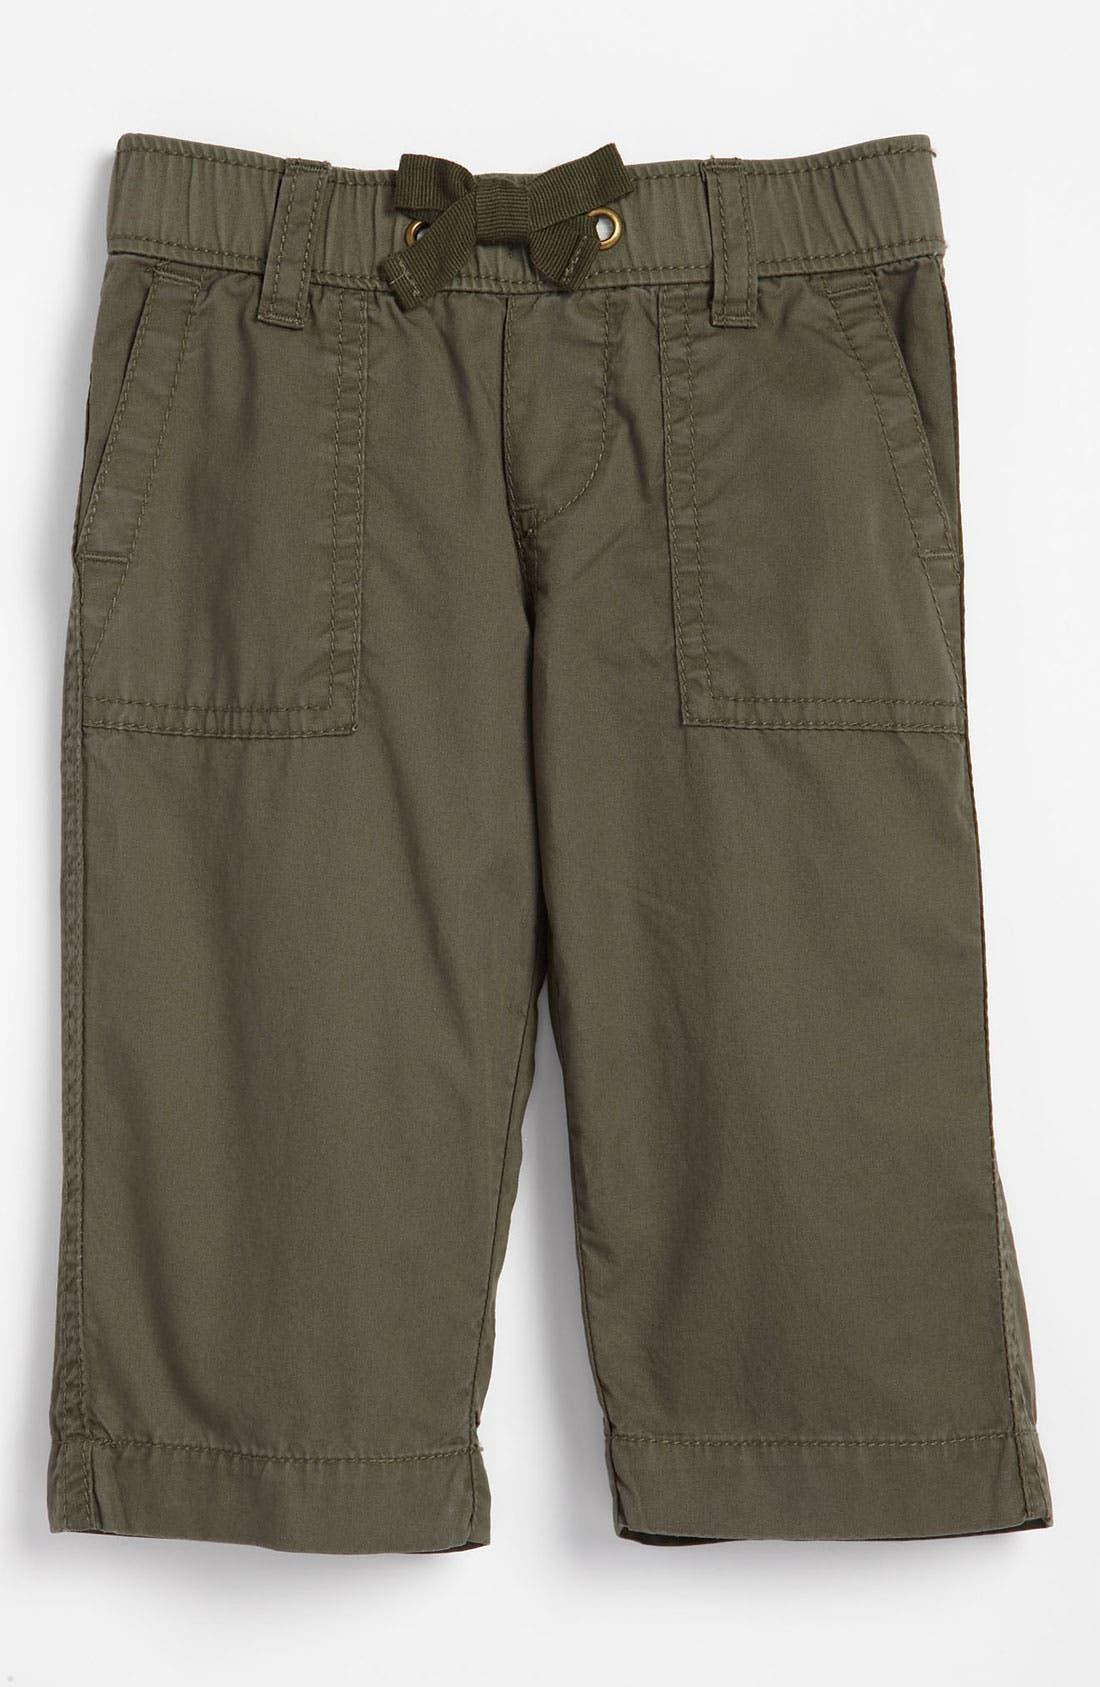 Alternate Image 1 Selected - Peek 'Tilden' Pants (Infant)